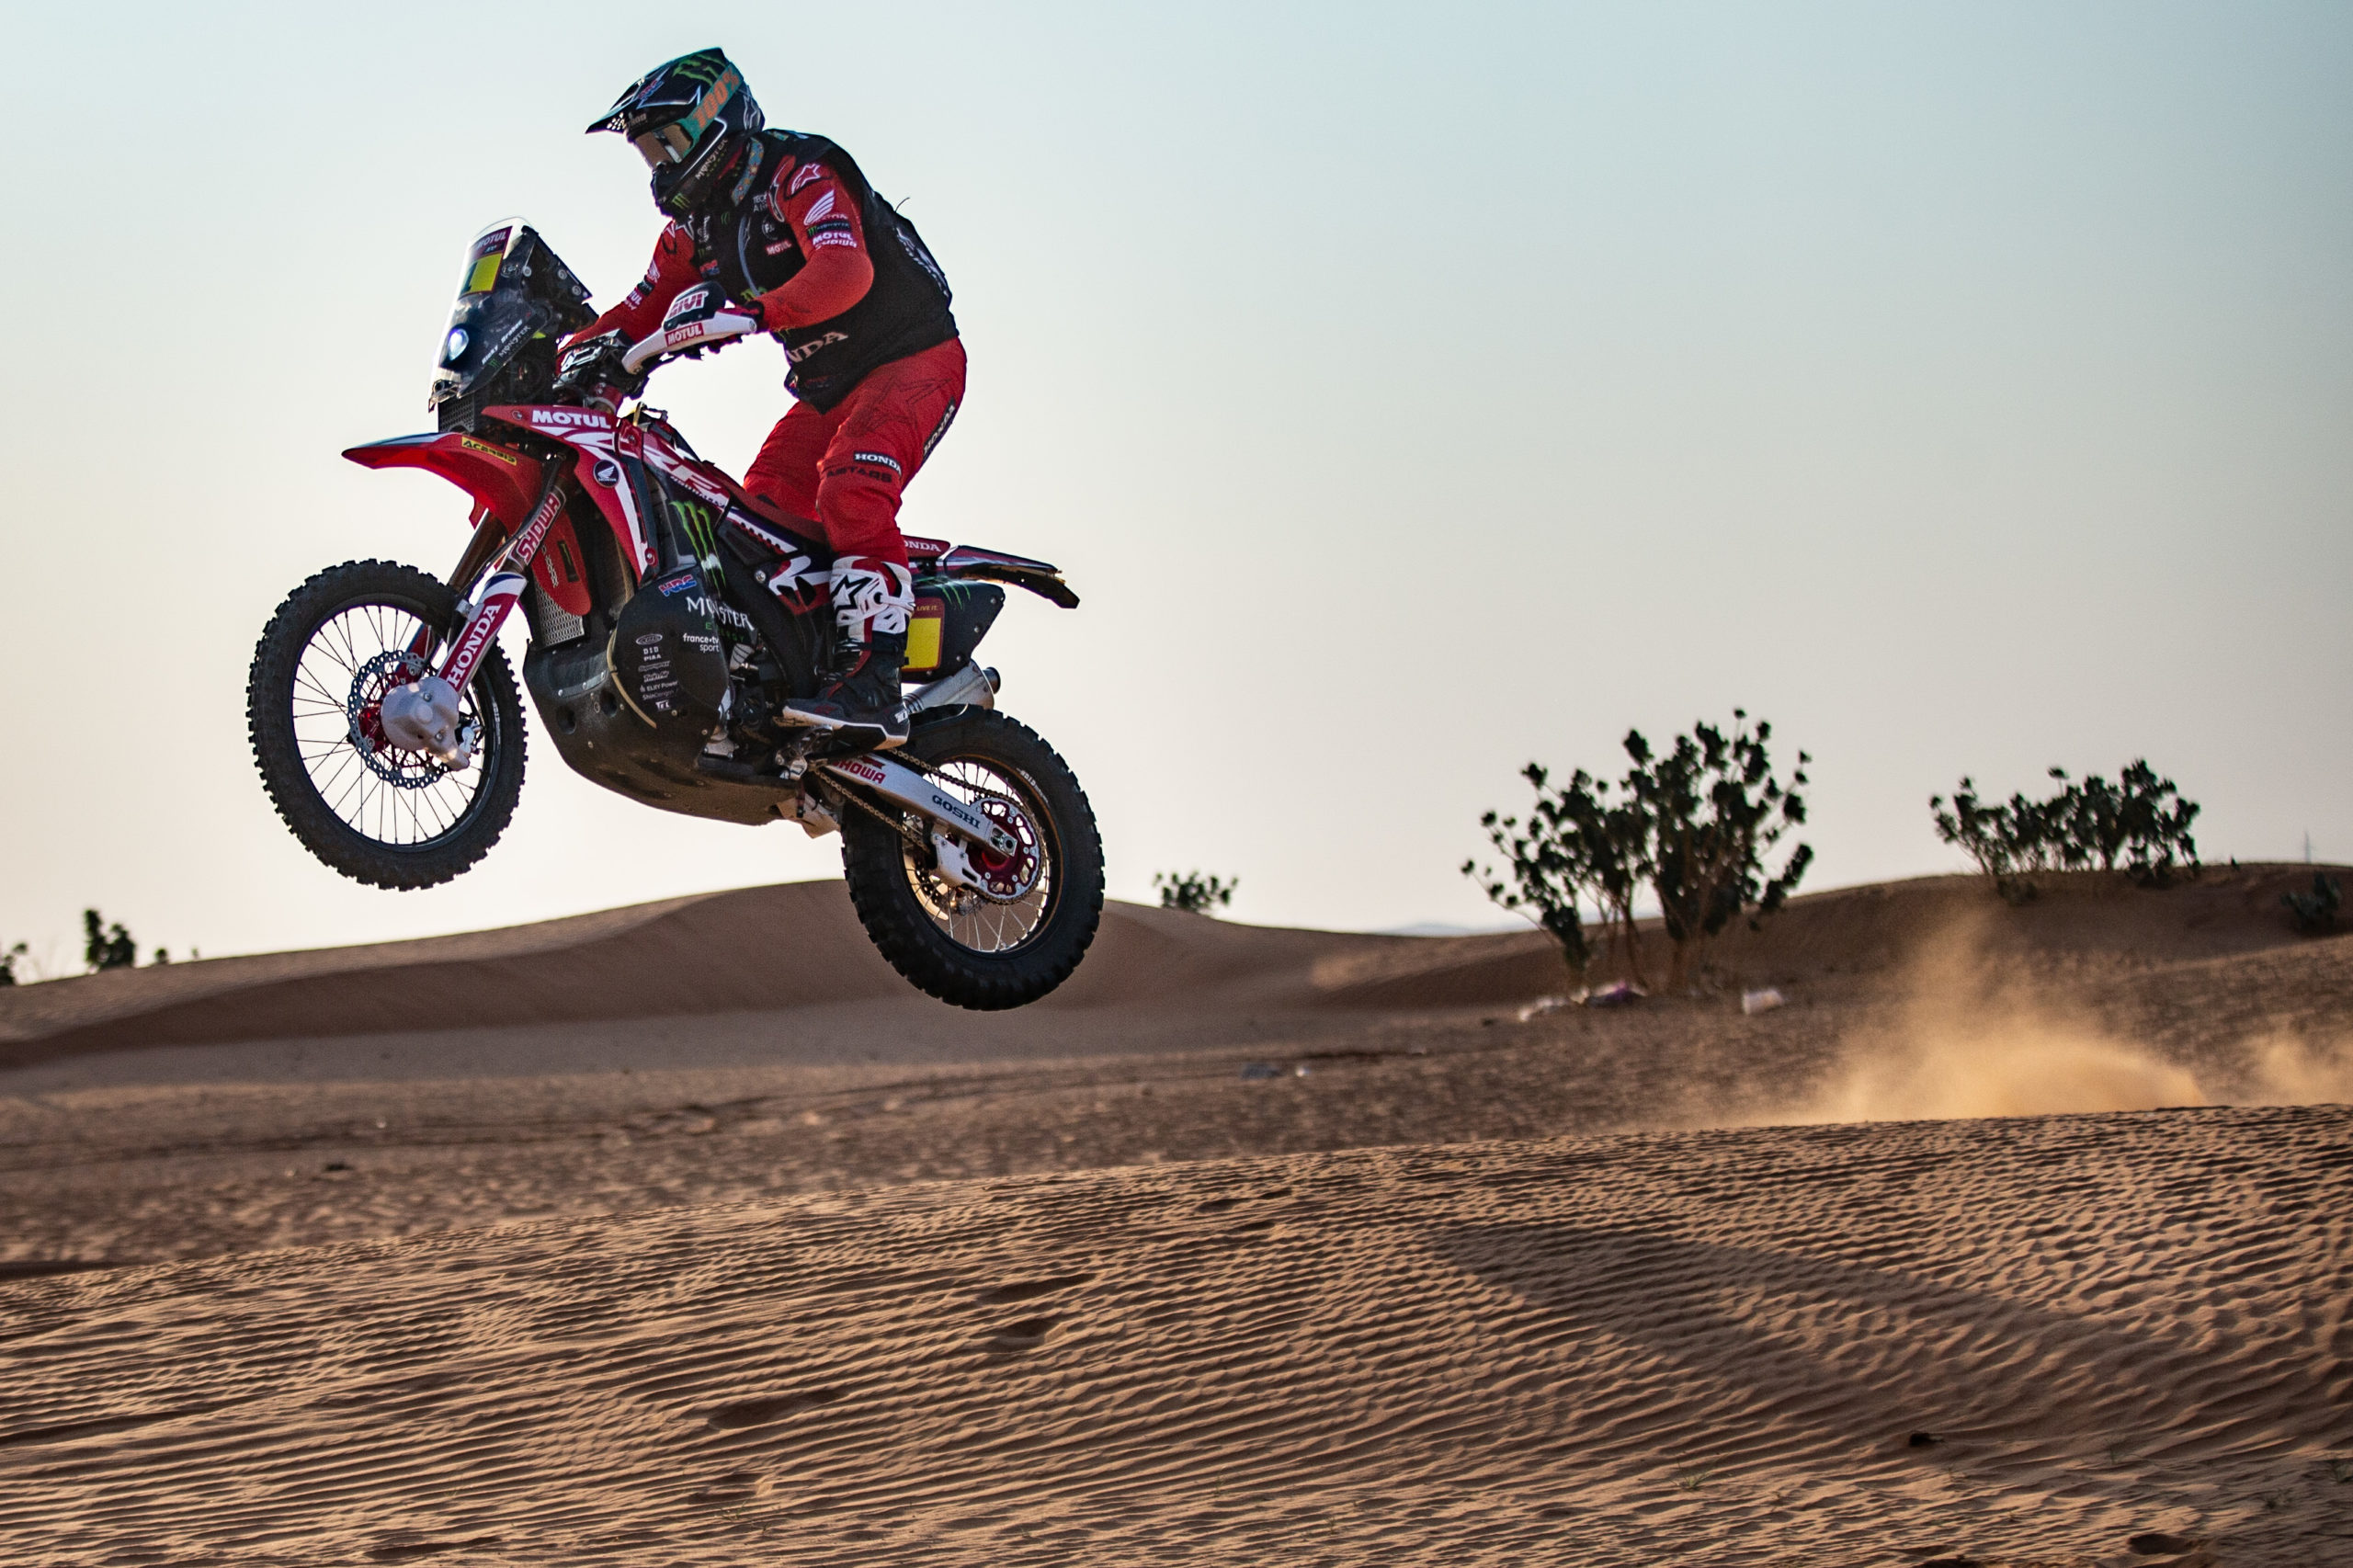 Ricky Brabec, Honda HRC, Dakar 2021